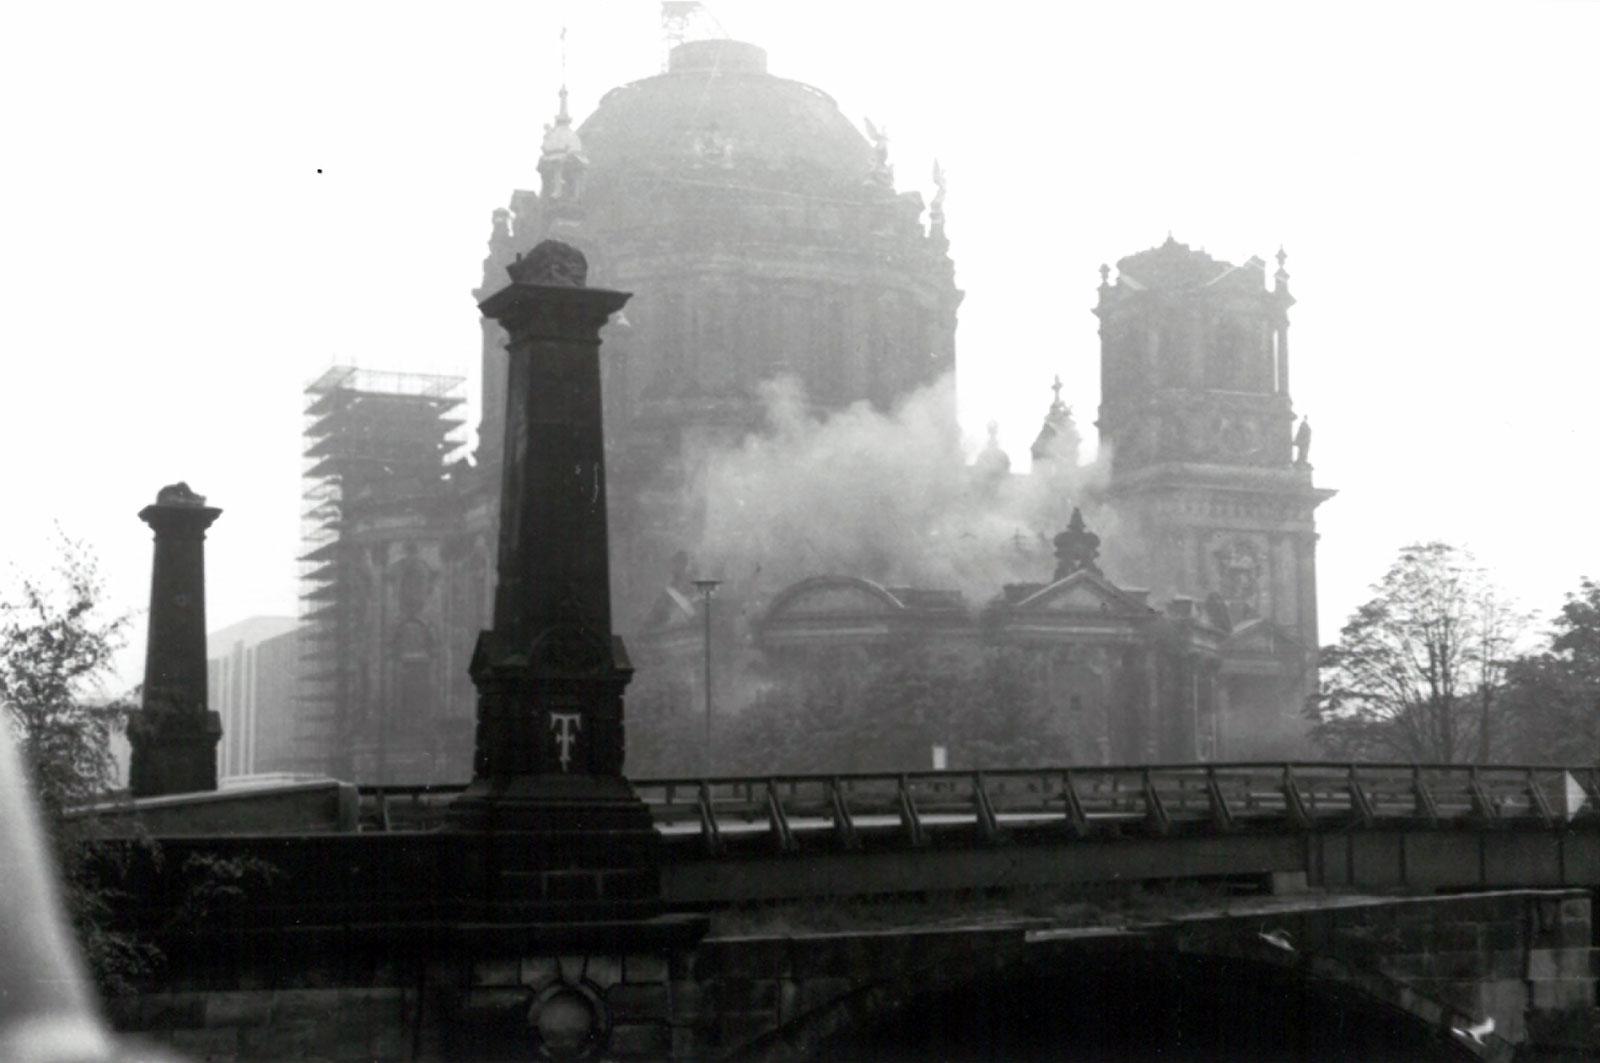 Abb. 17: Sprengung des Daches der Denkmalskirche 1975, Registratur Dombaubüro (Foto: Rüdiger Hoth)